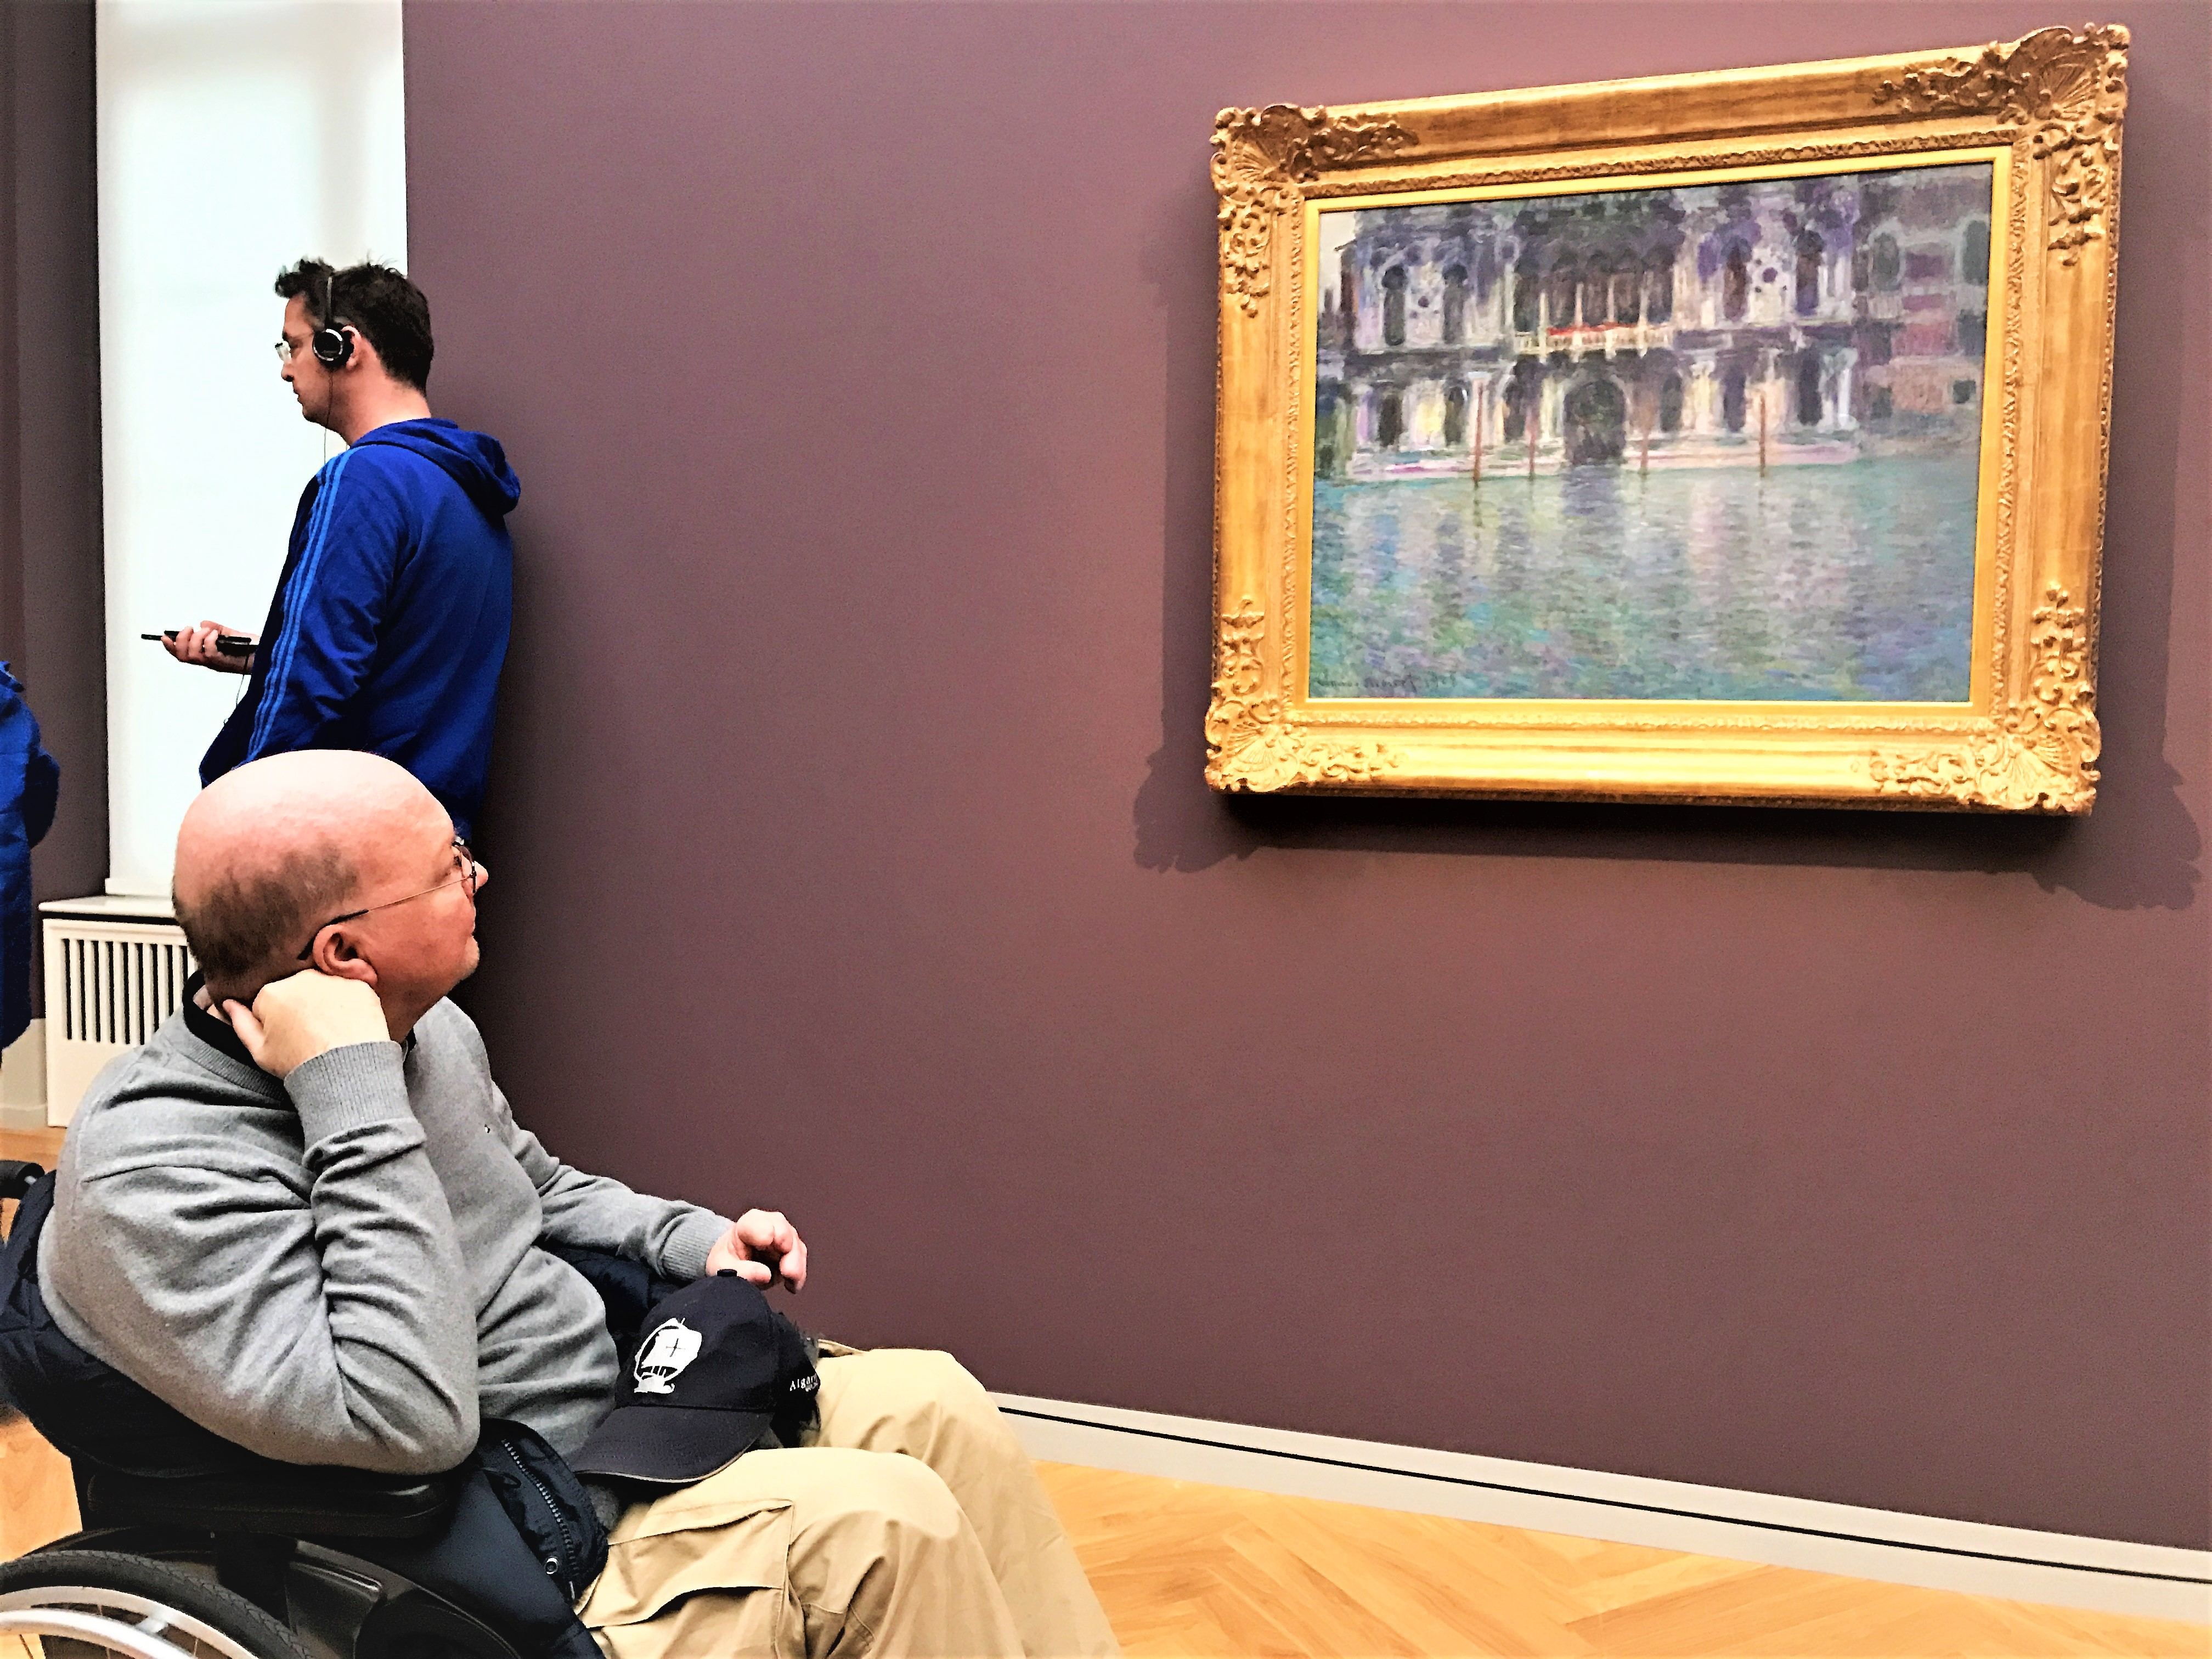 Alexander Kroll im Museum Barberini in Potsdam